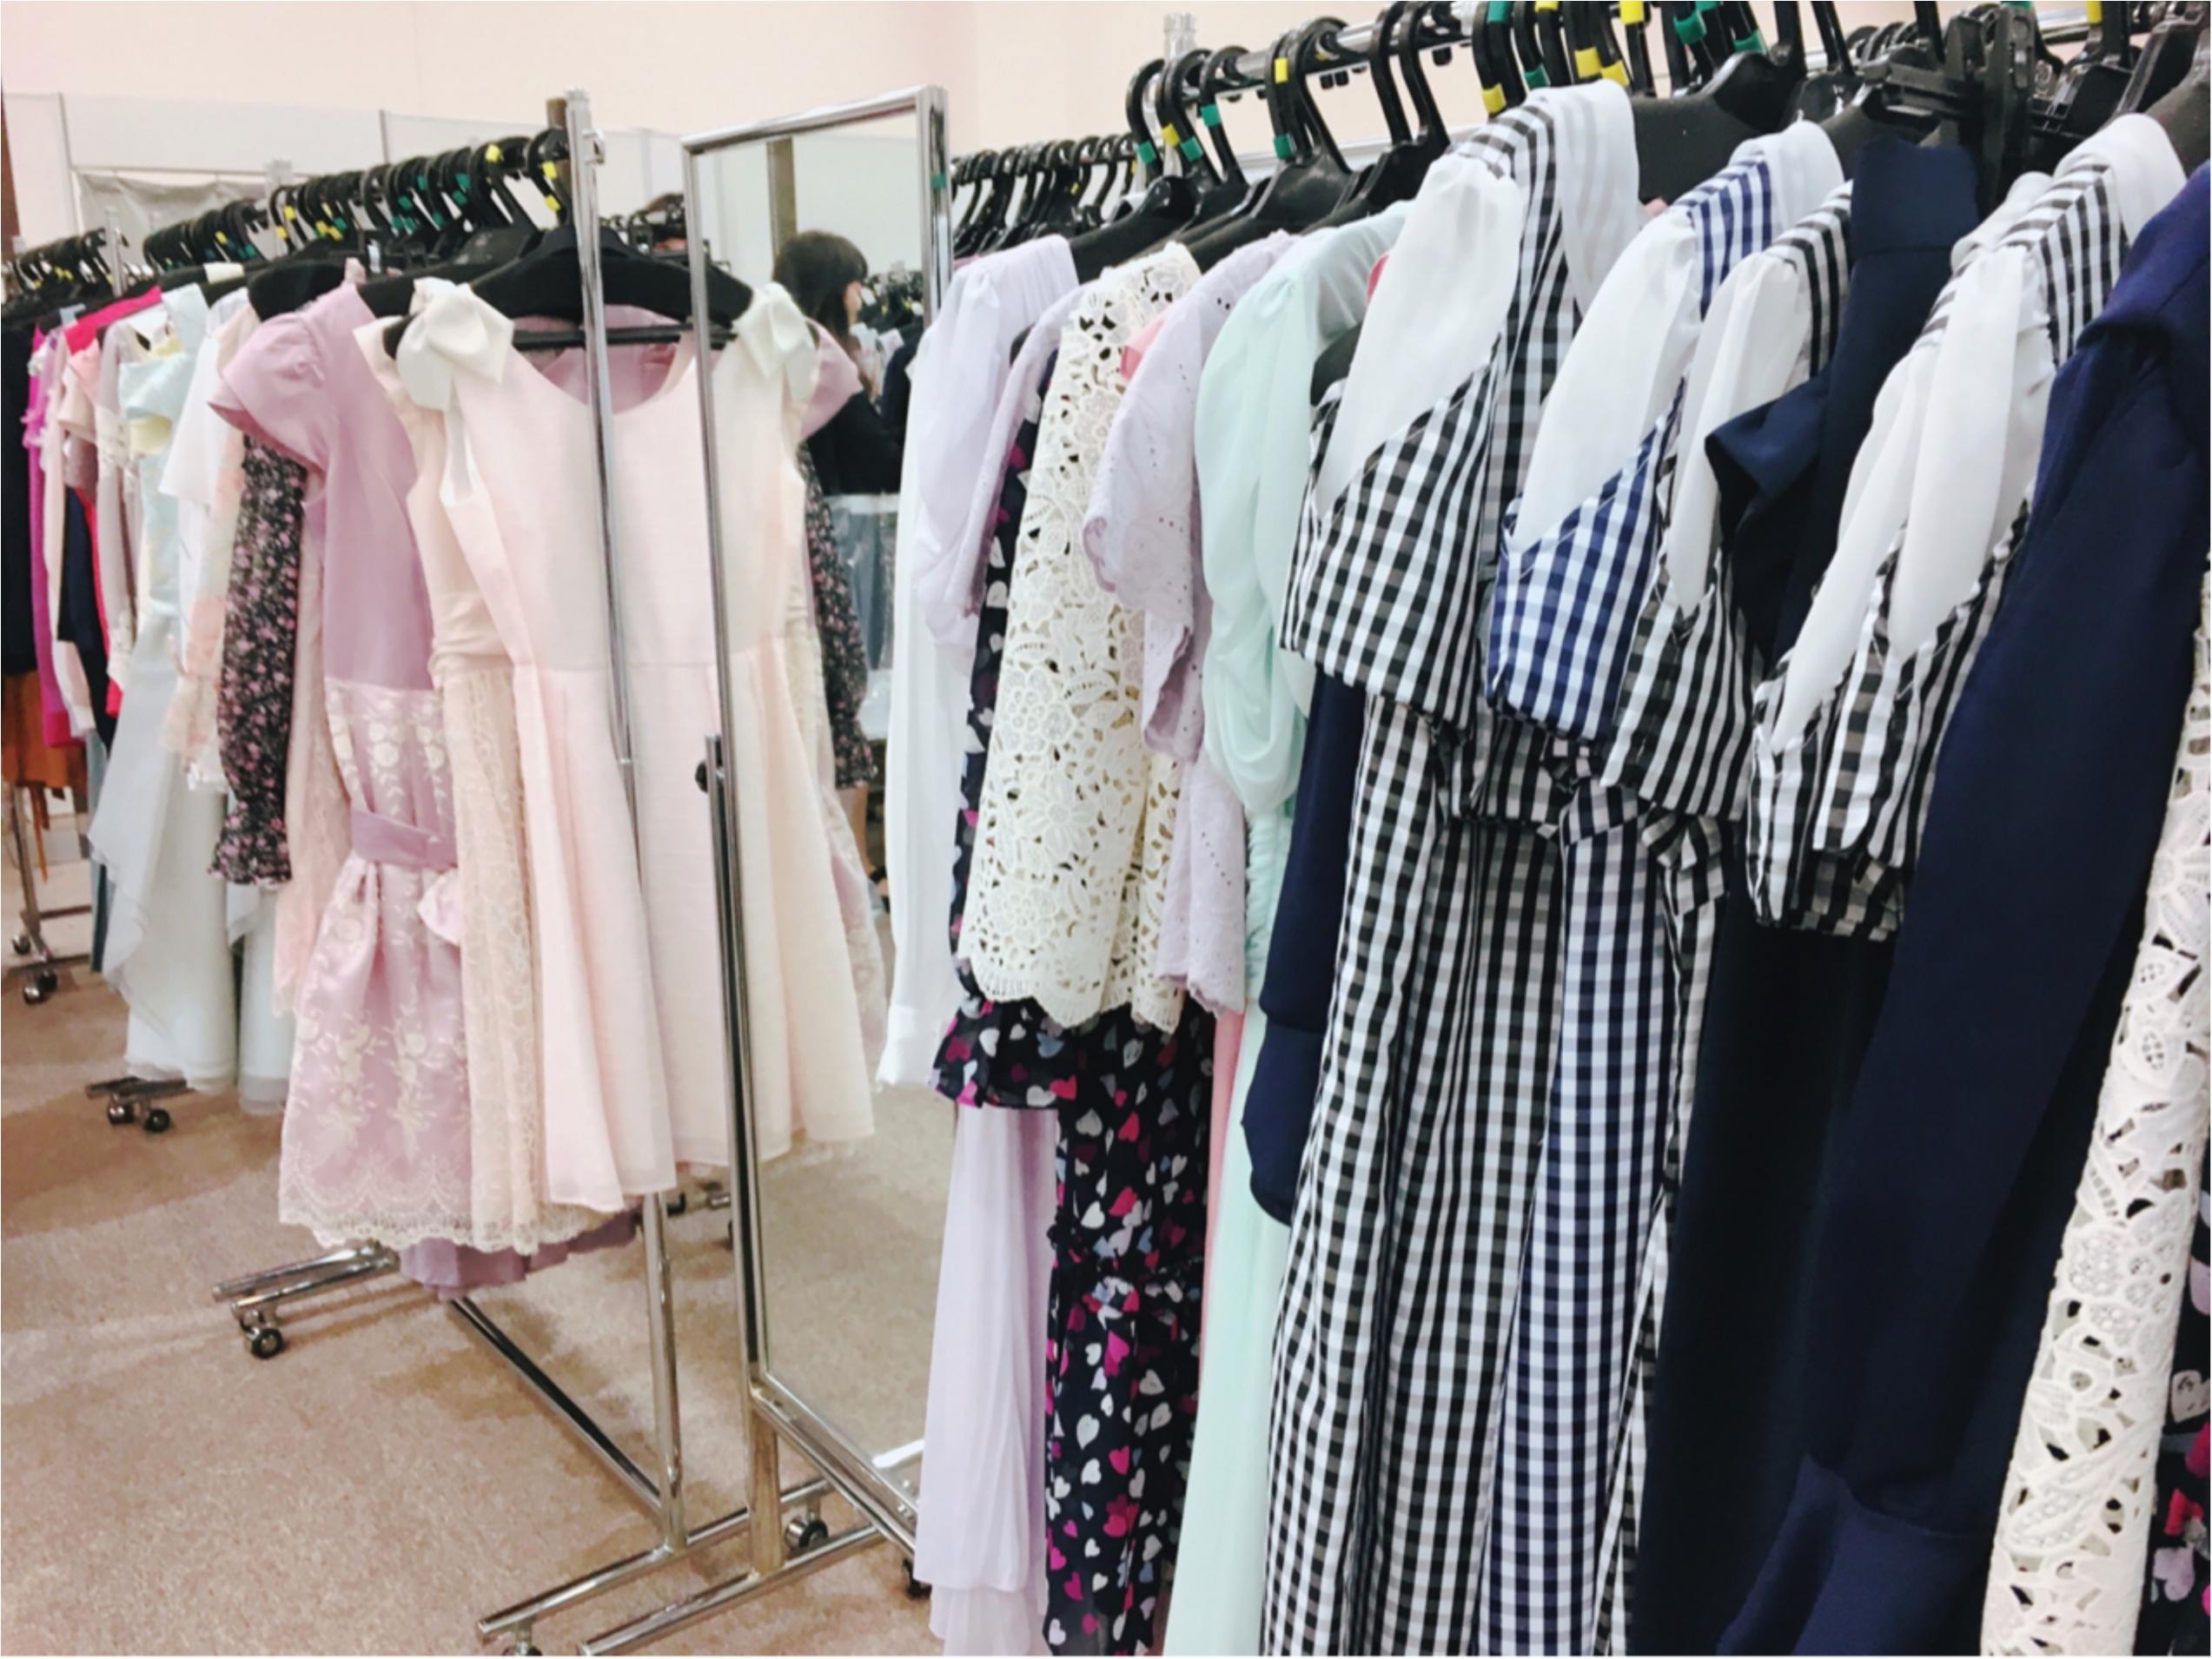 【TOKYO OUTLET WEEK】週末はファッションアウトレットイベントへ!お買い得すぎる戦利品公開♡_6